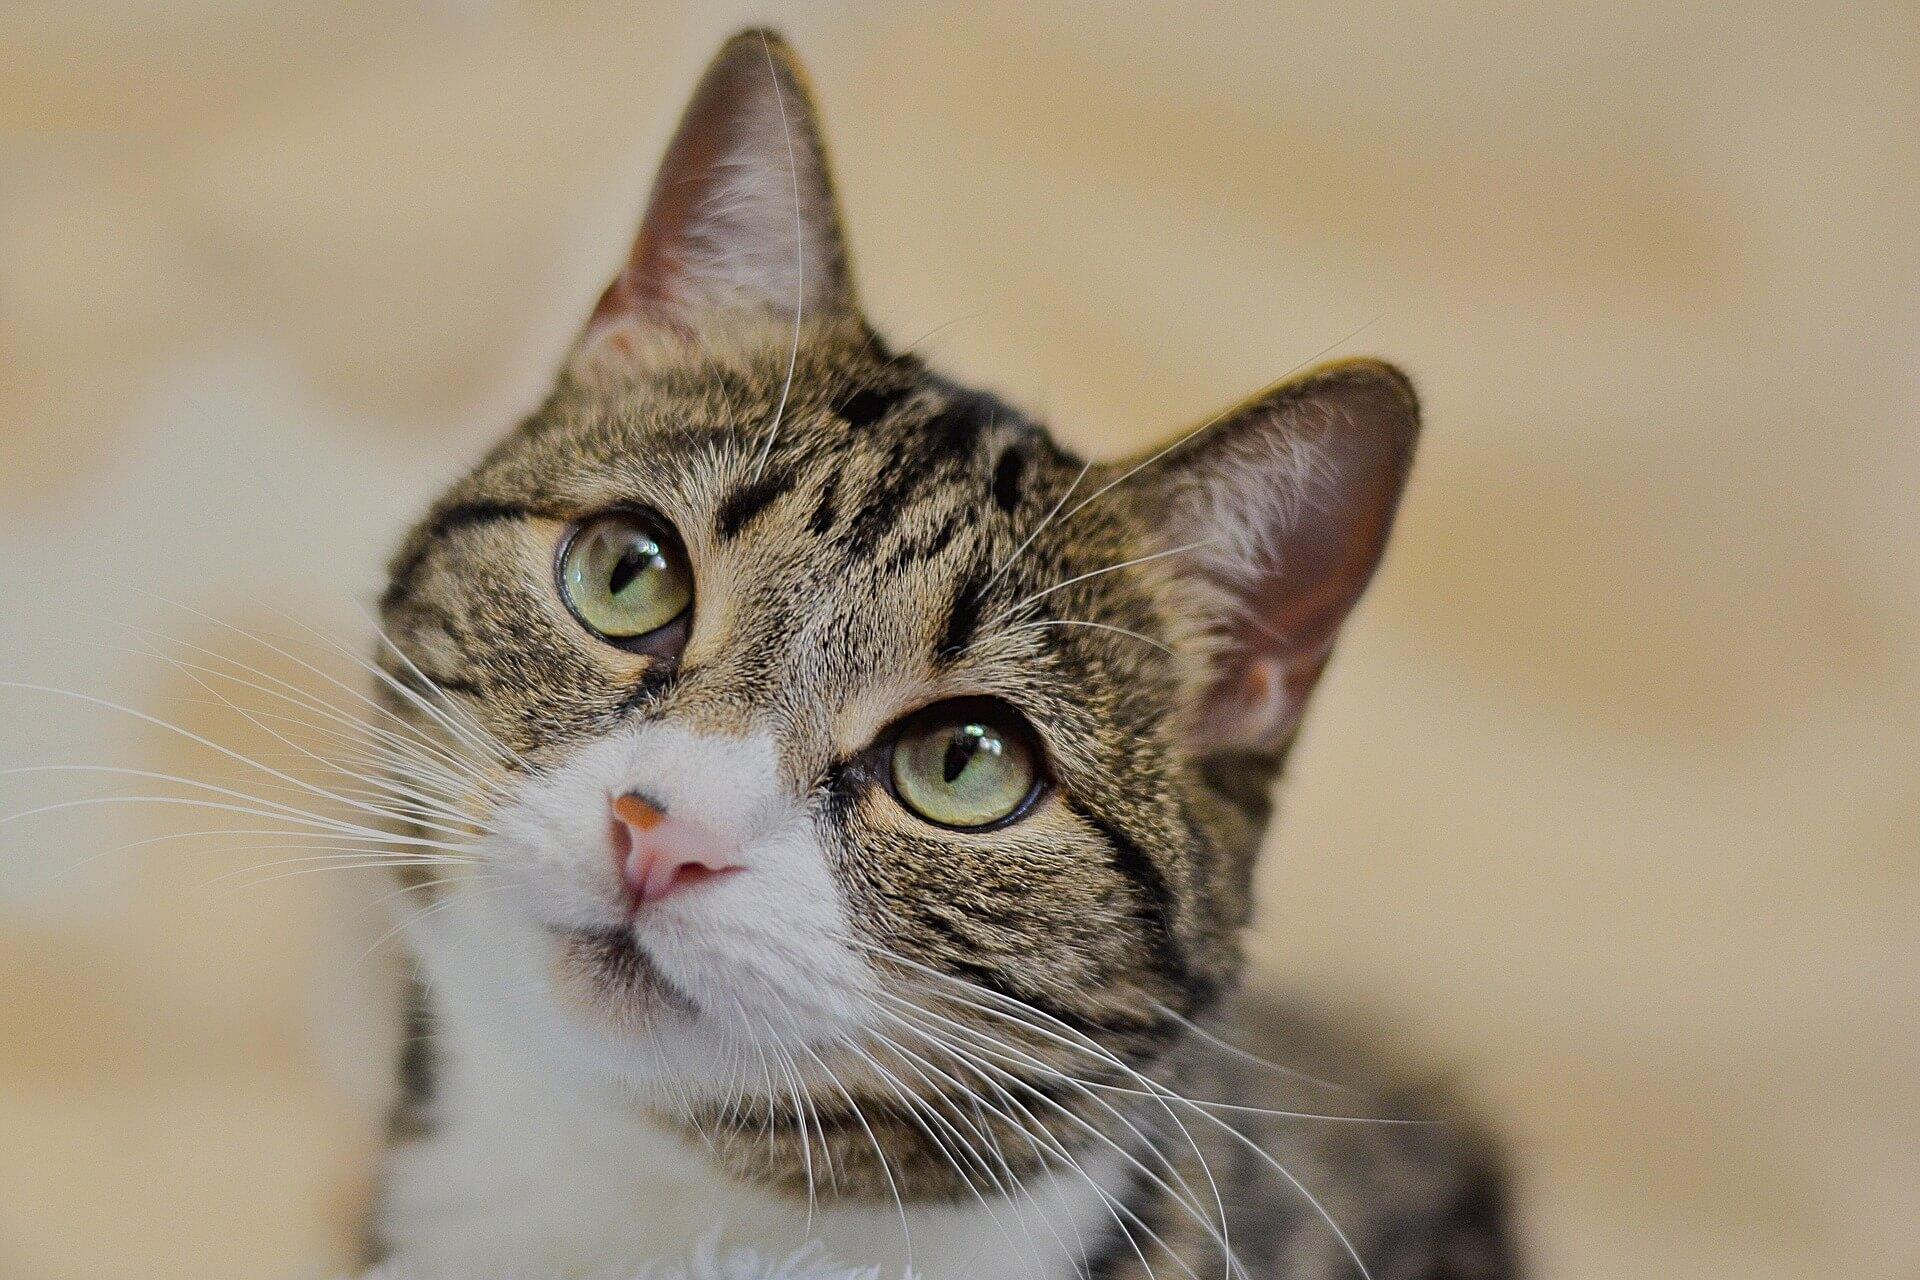 Katze ist neugierig